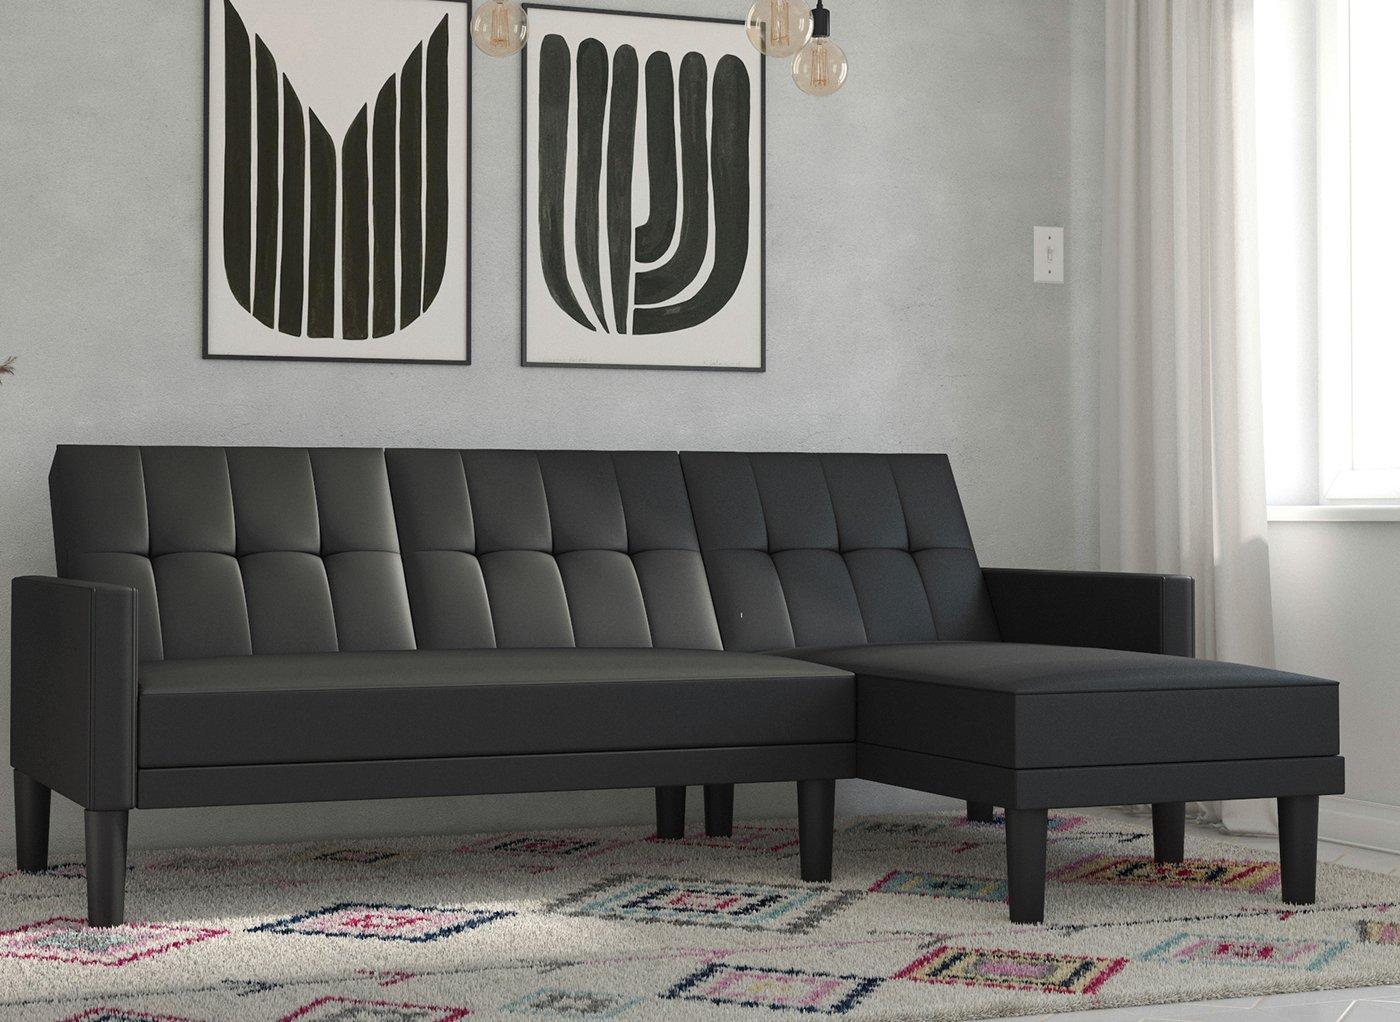 Valentina 3 Seater Faux Leather Corner Sofa Bed - Black